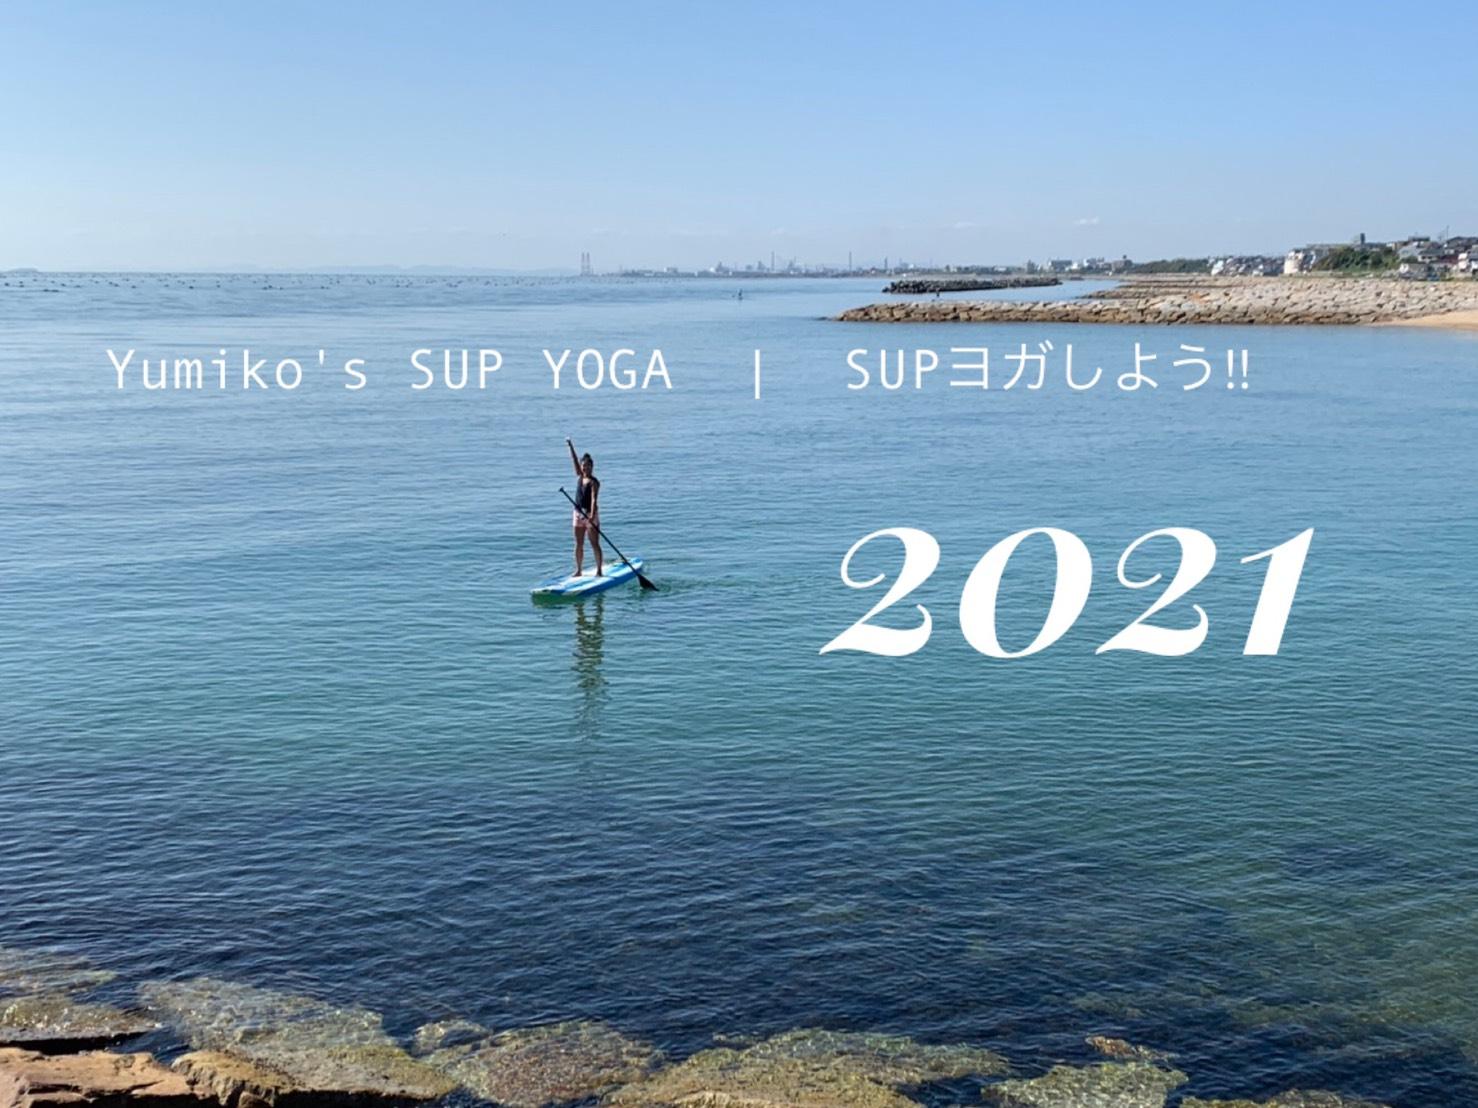 SUPヨガ2021シーズンイン!!リピーター限定アーリーバード割引!